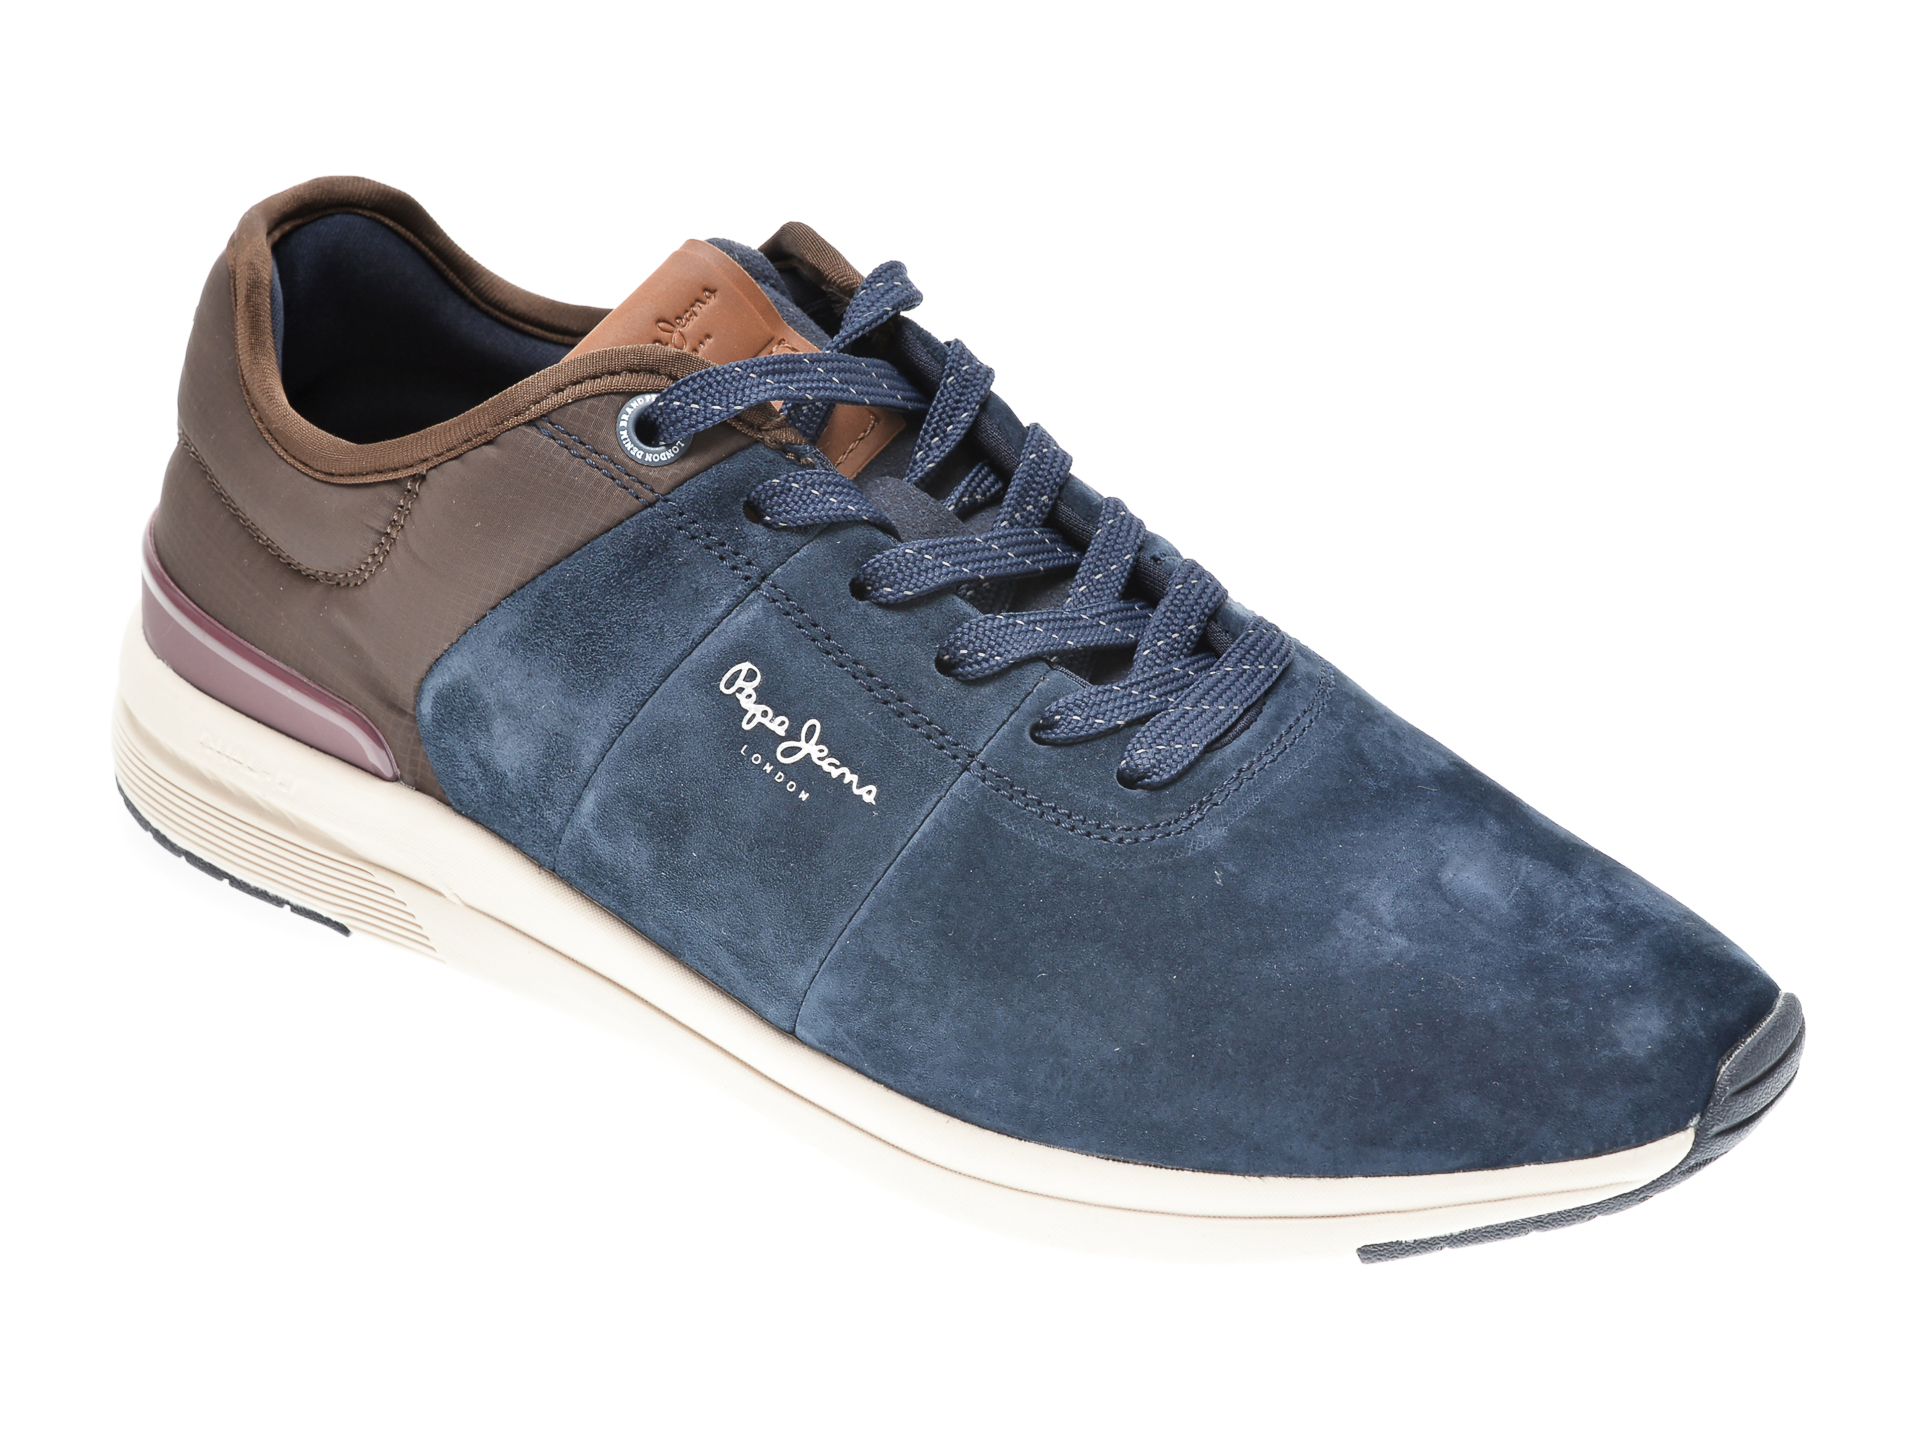 Pantofi sport PEPE JEANS albastri, MS30638, din piele intoarsa